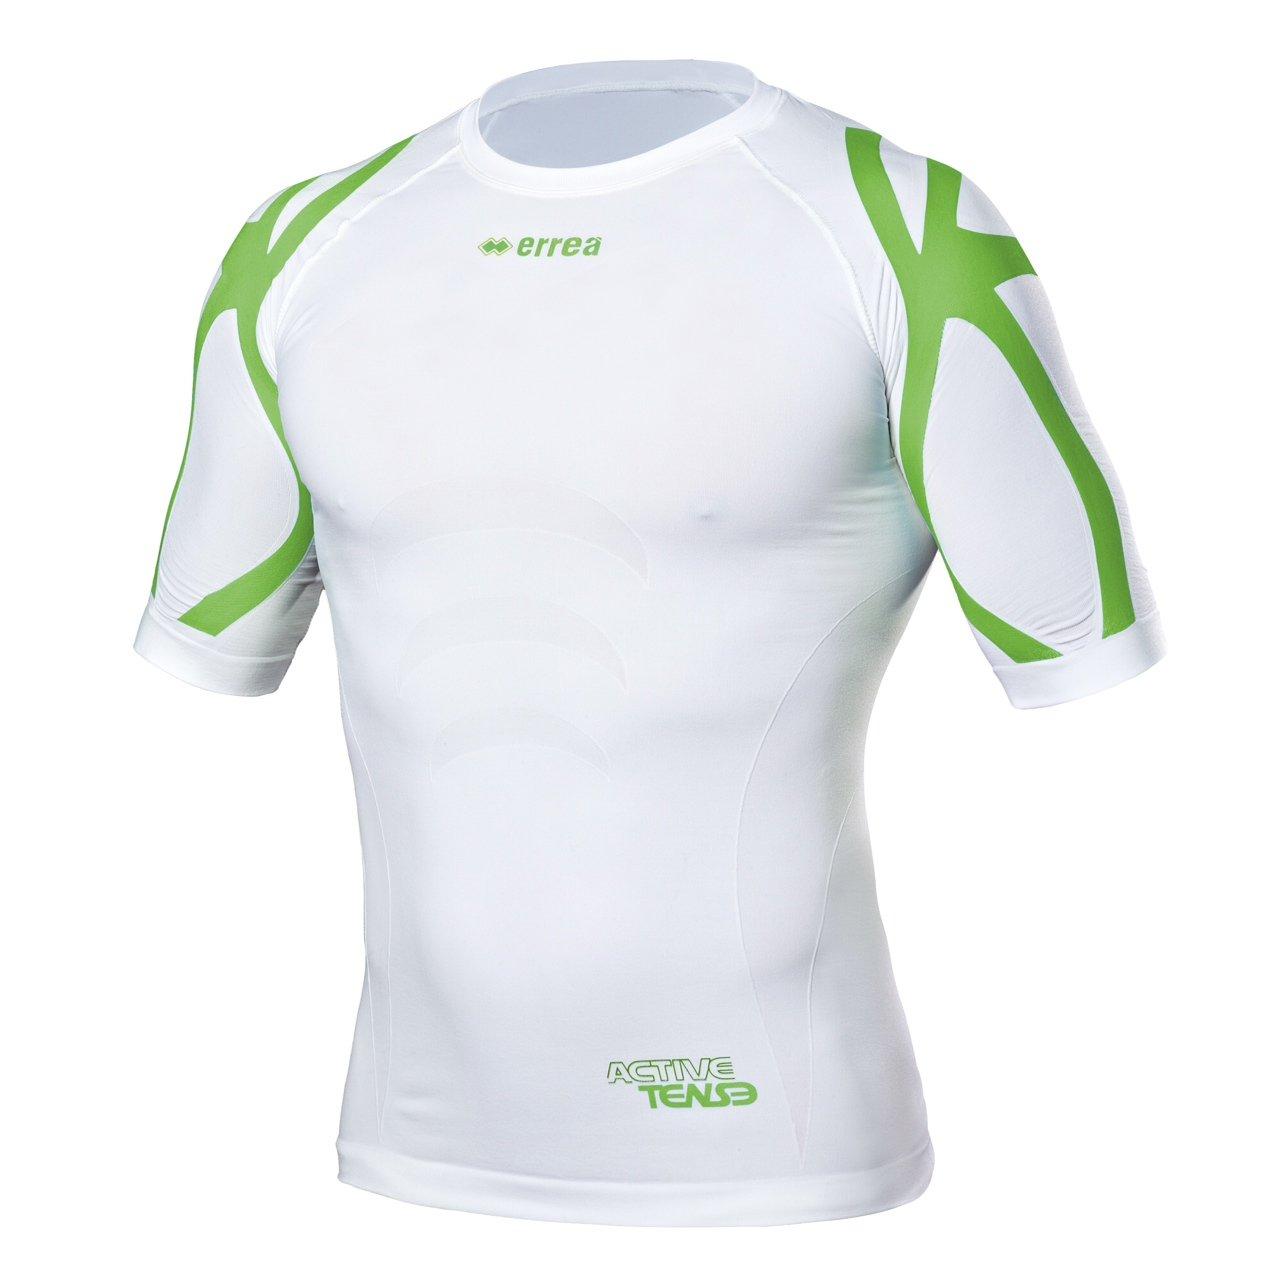 Erre� Tee-shirt Fysio Active Tense M v�tement running homme